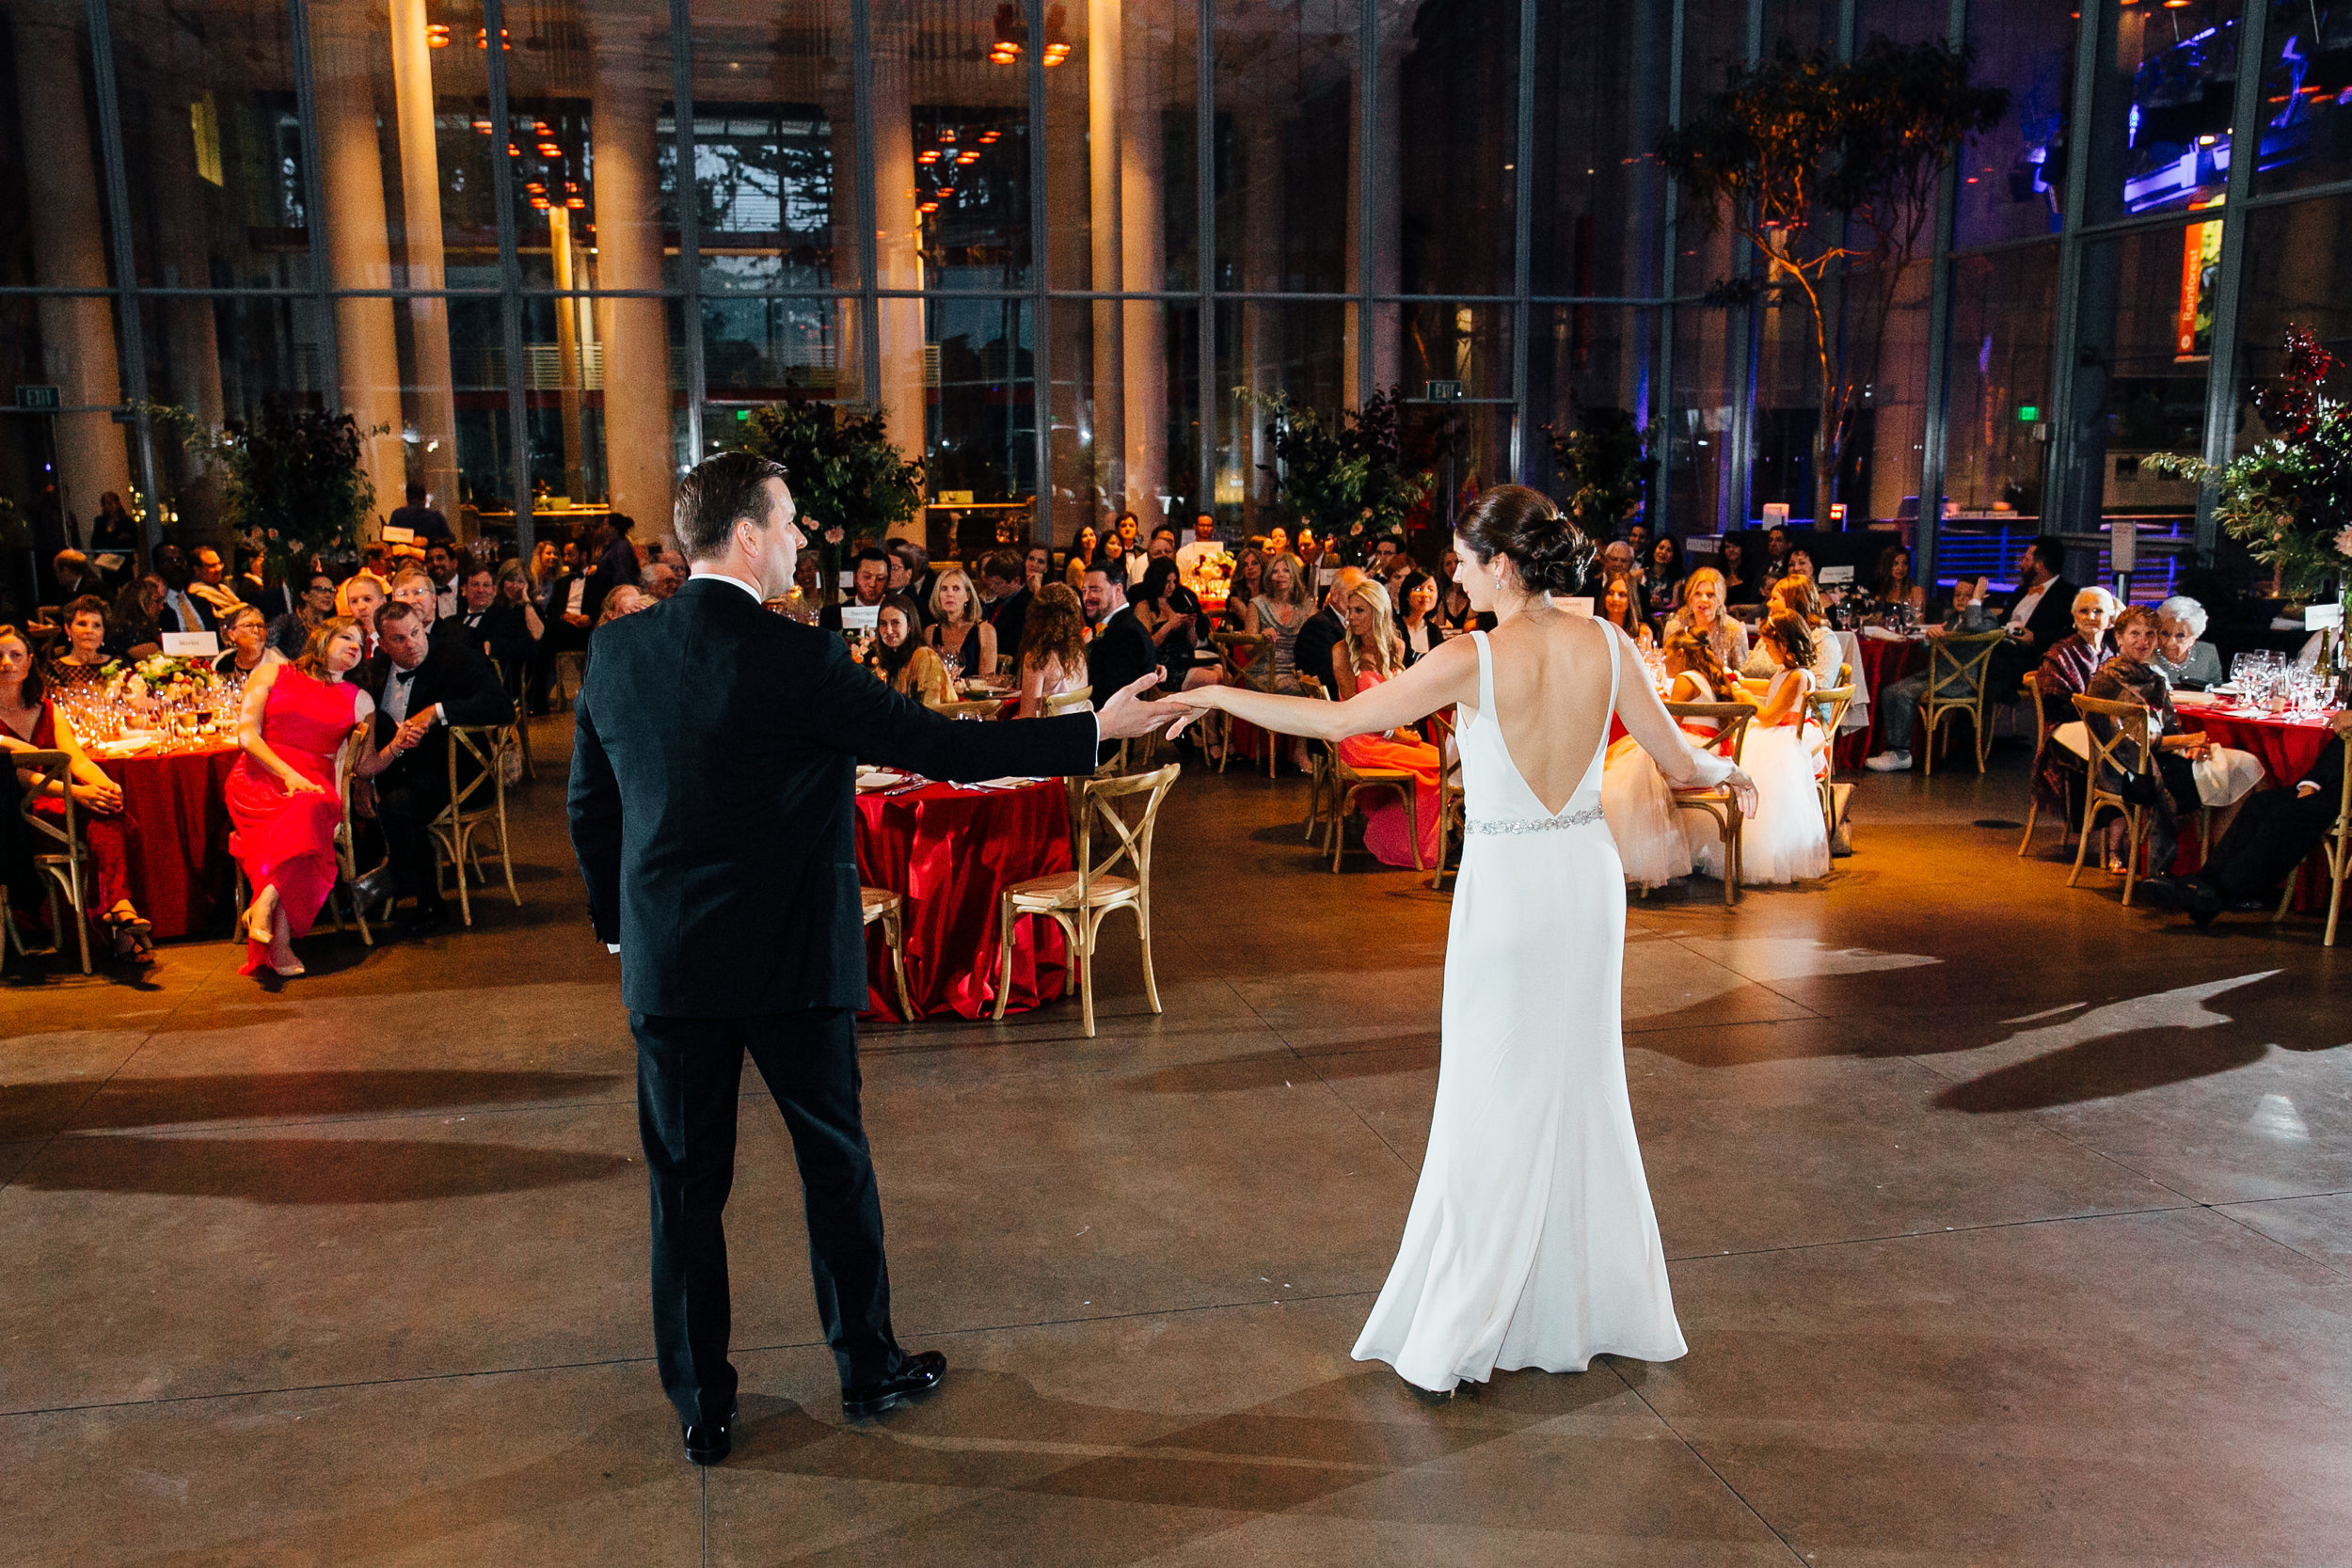 Wedding_KathleenMichael_Reception-184.jpg